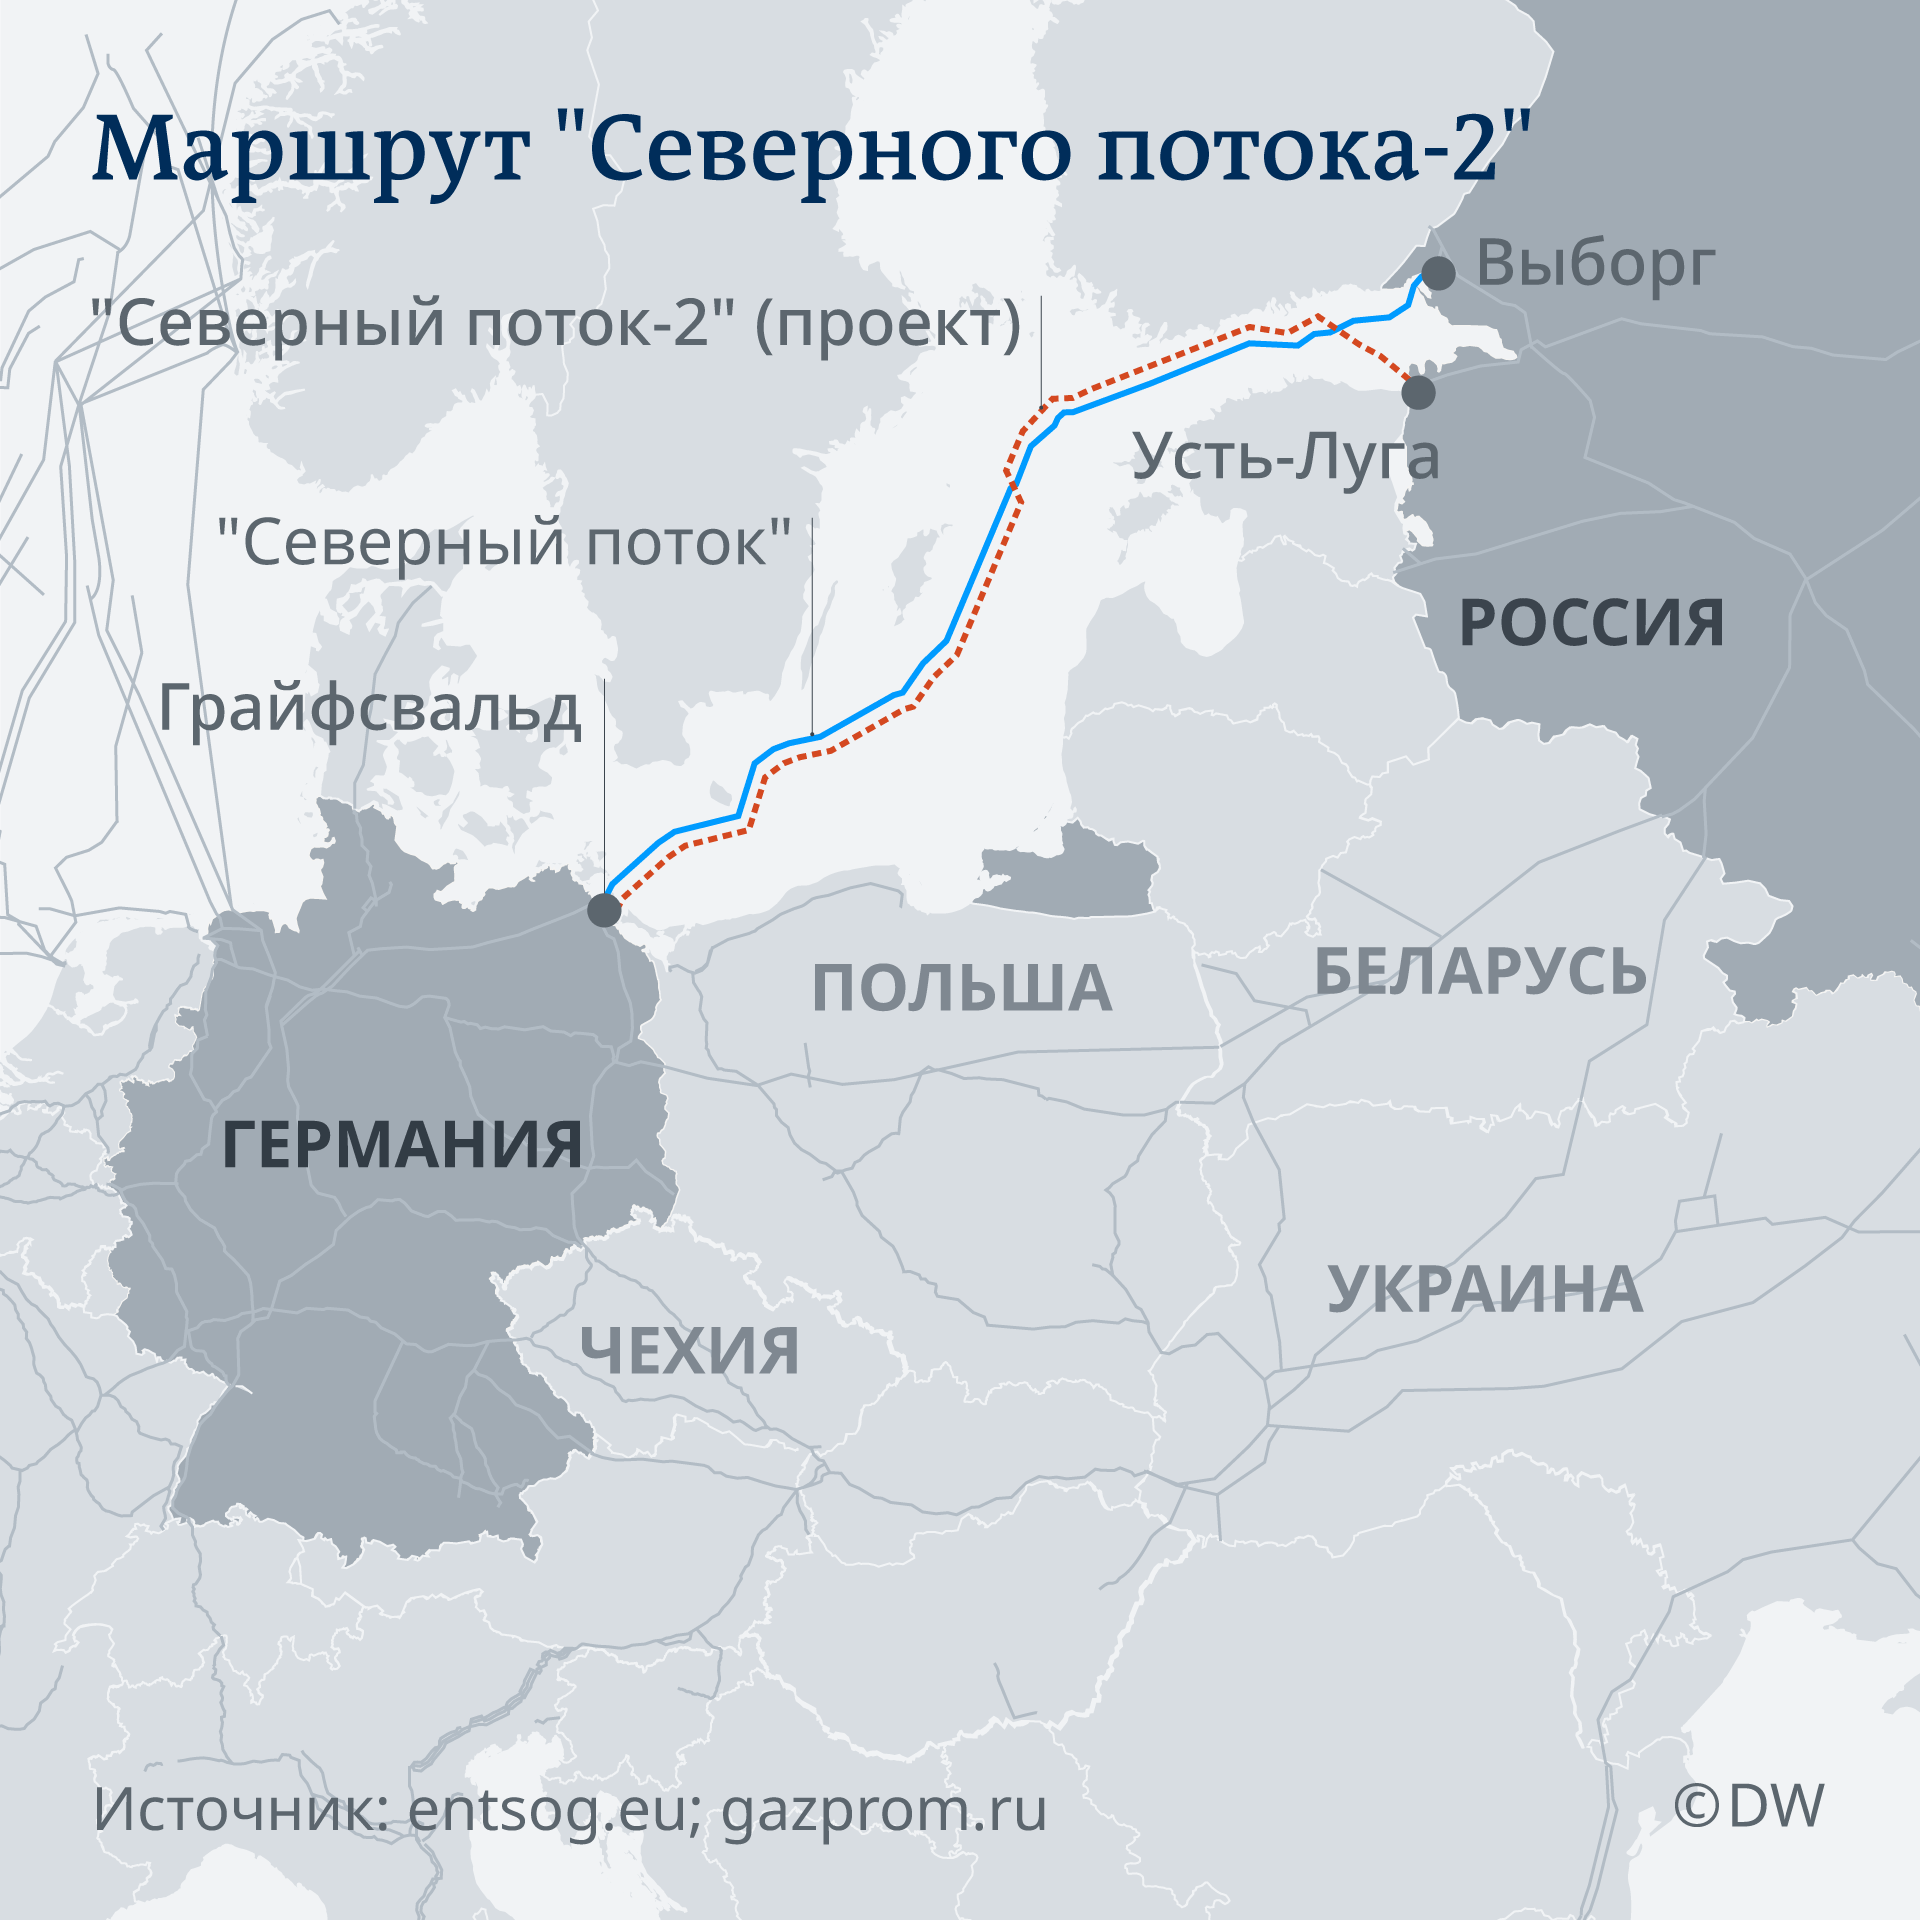 Инфографика: маршрут Северного потока-2